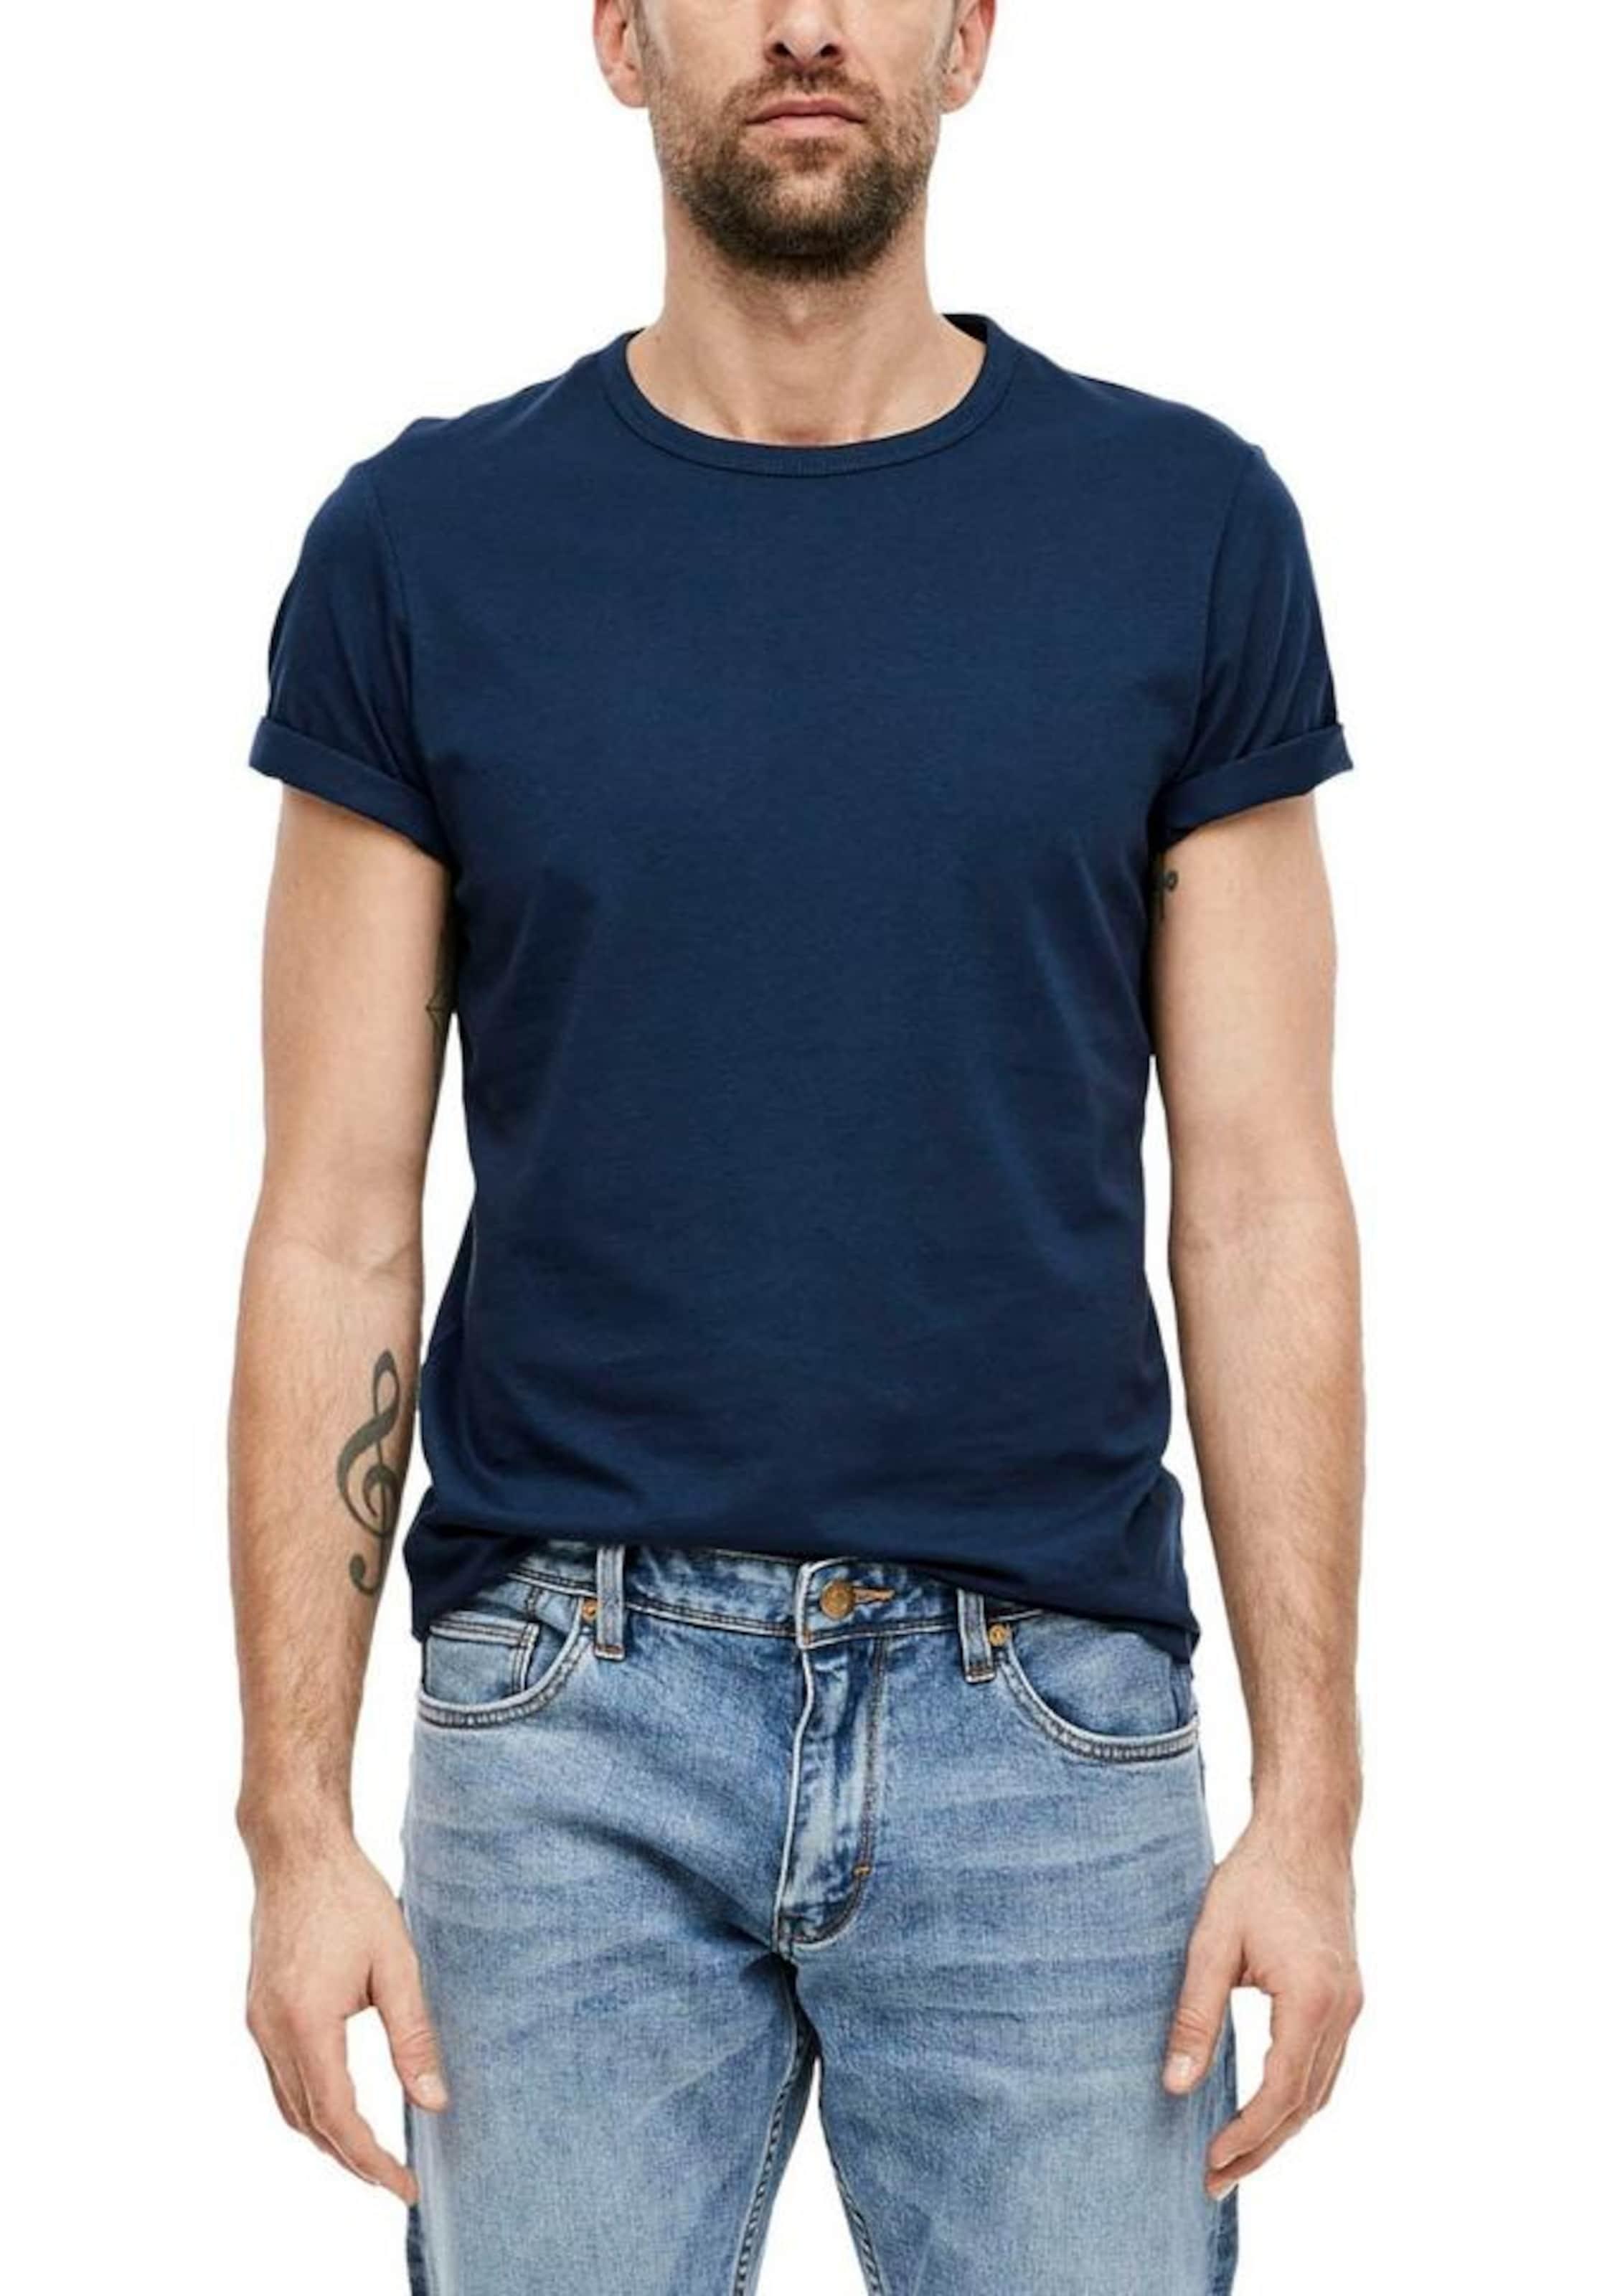 s.Oliver T-Shirt in dunkelblau Unifarben 03.899.32.5049.5865.L